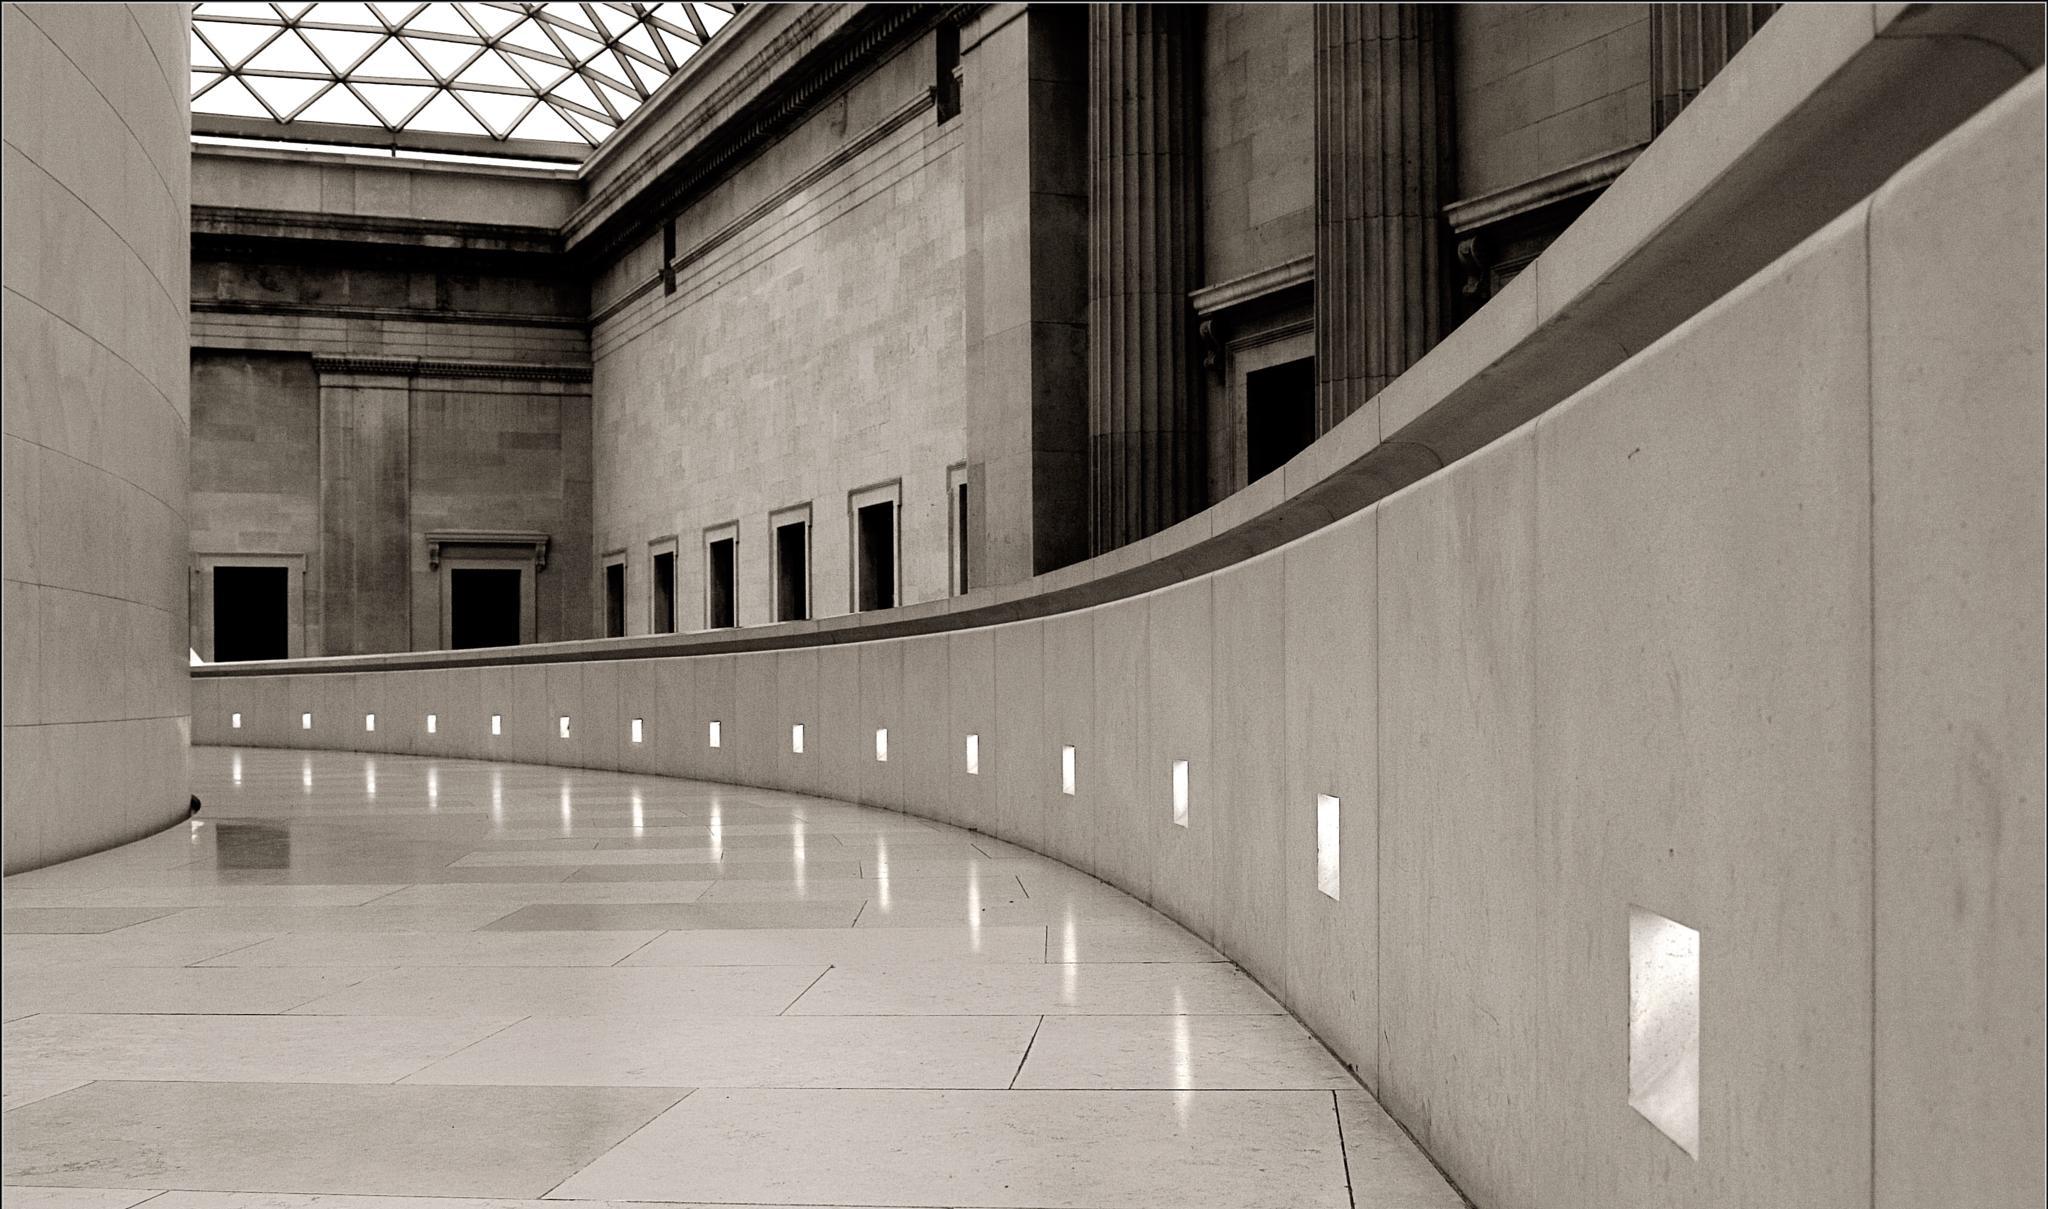 British Museum, London  by Robert Bilinski